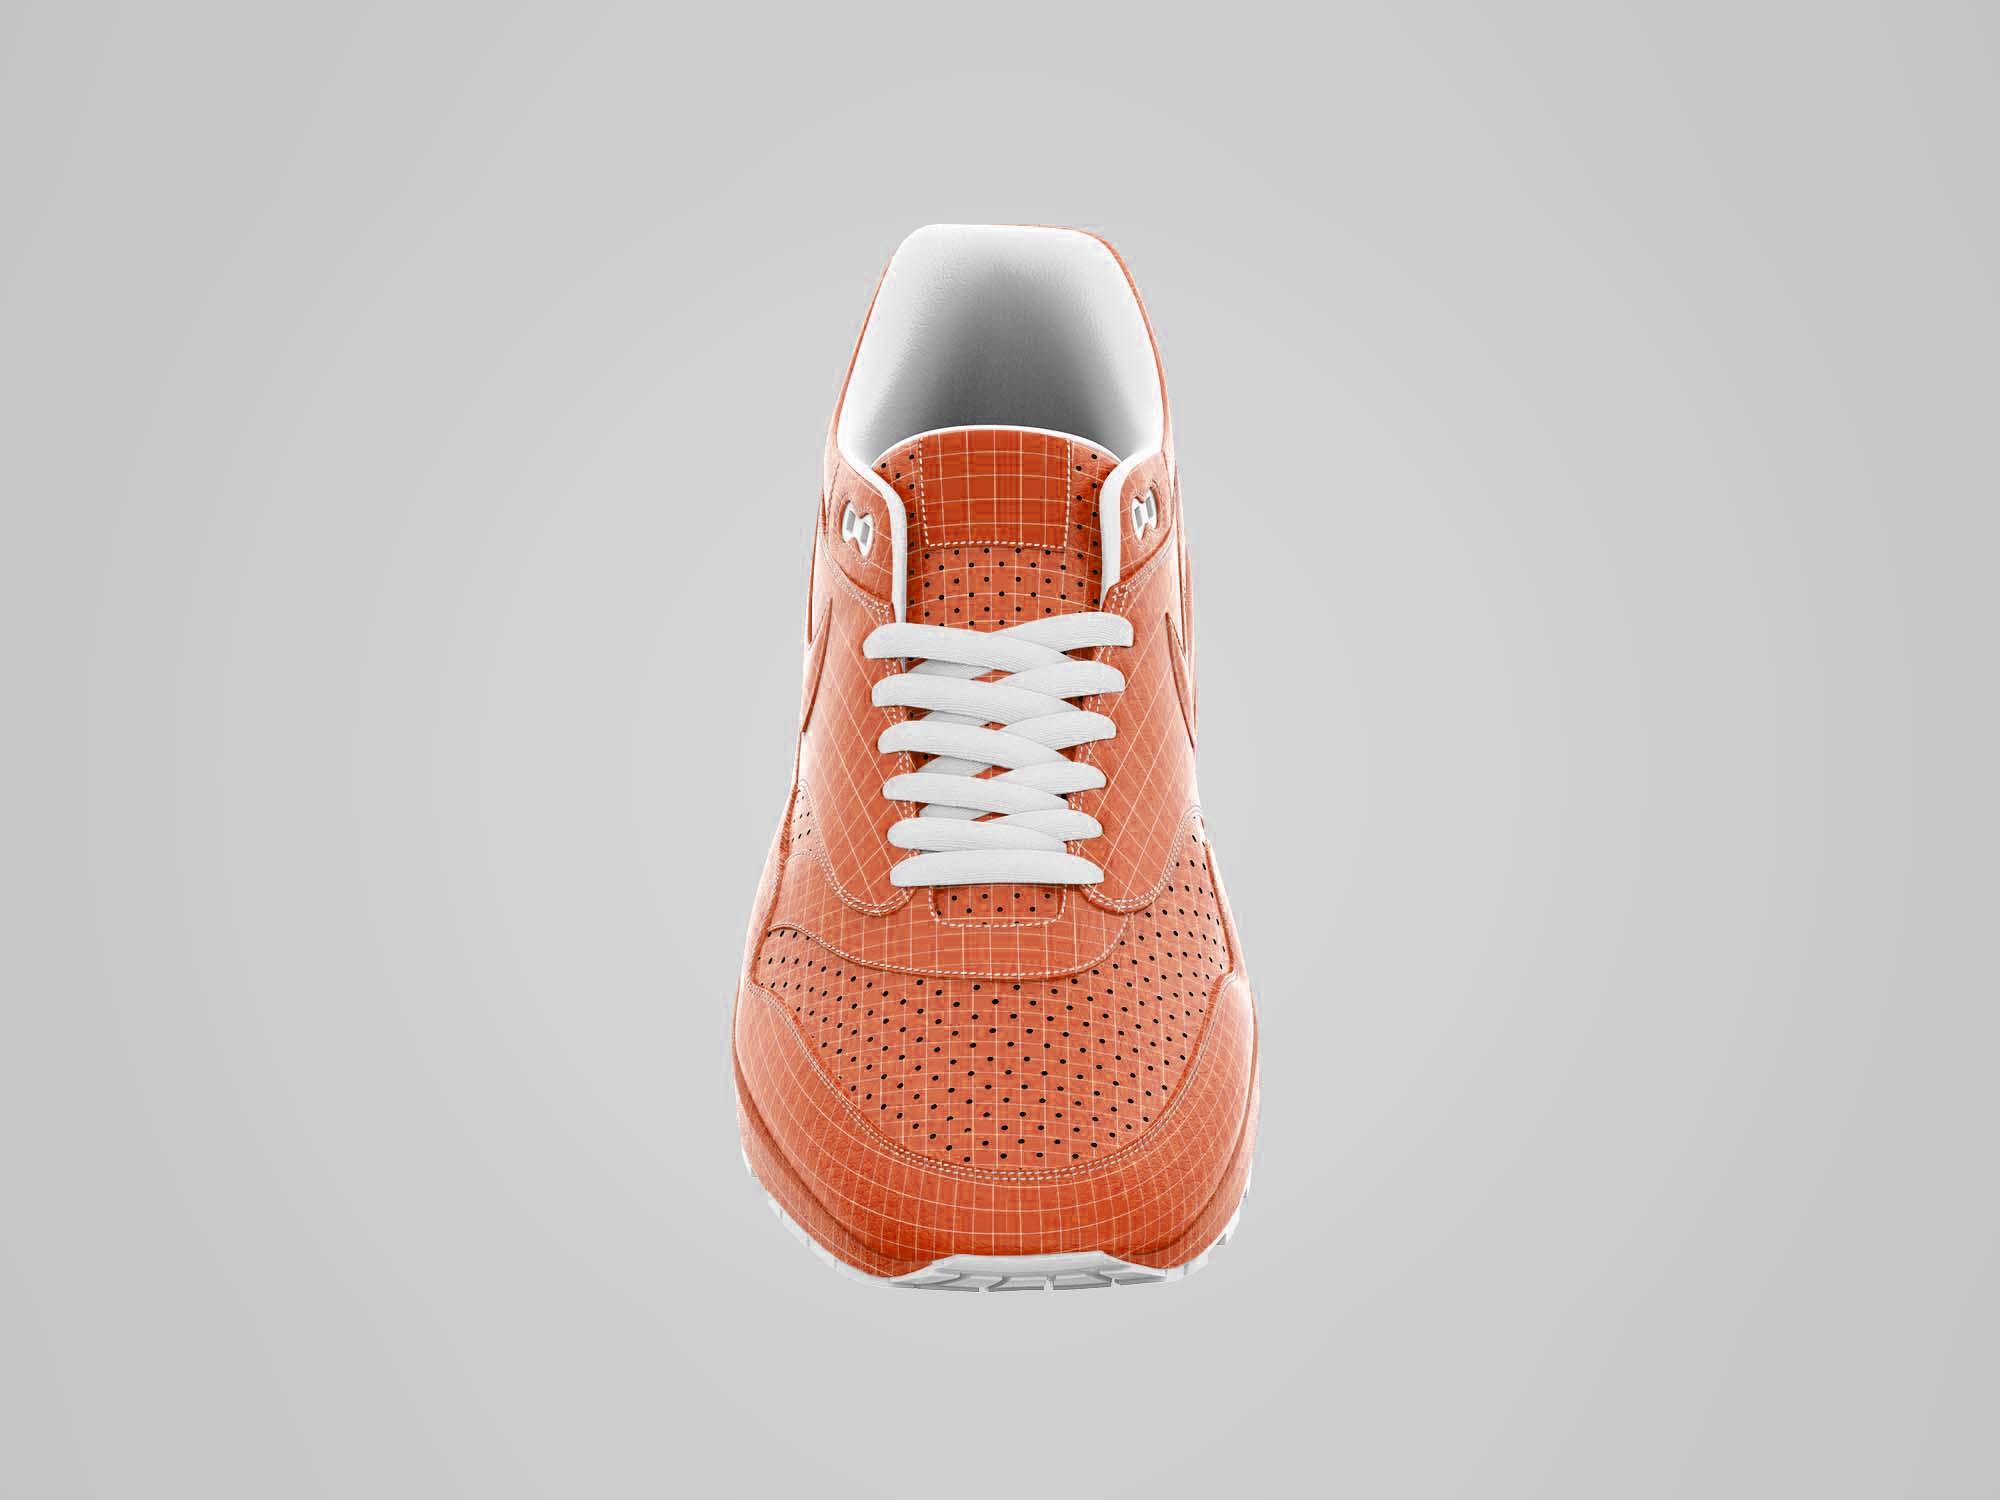 brand new 0e892 6109c Free Shoes Mockup PSD